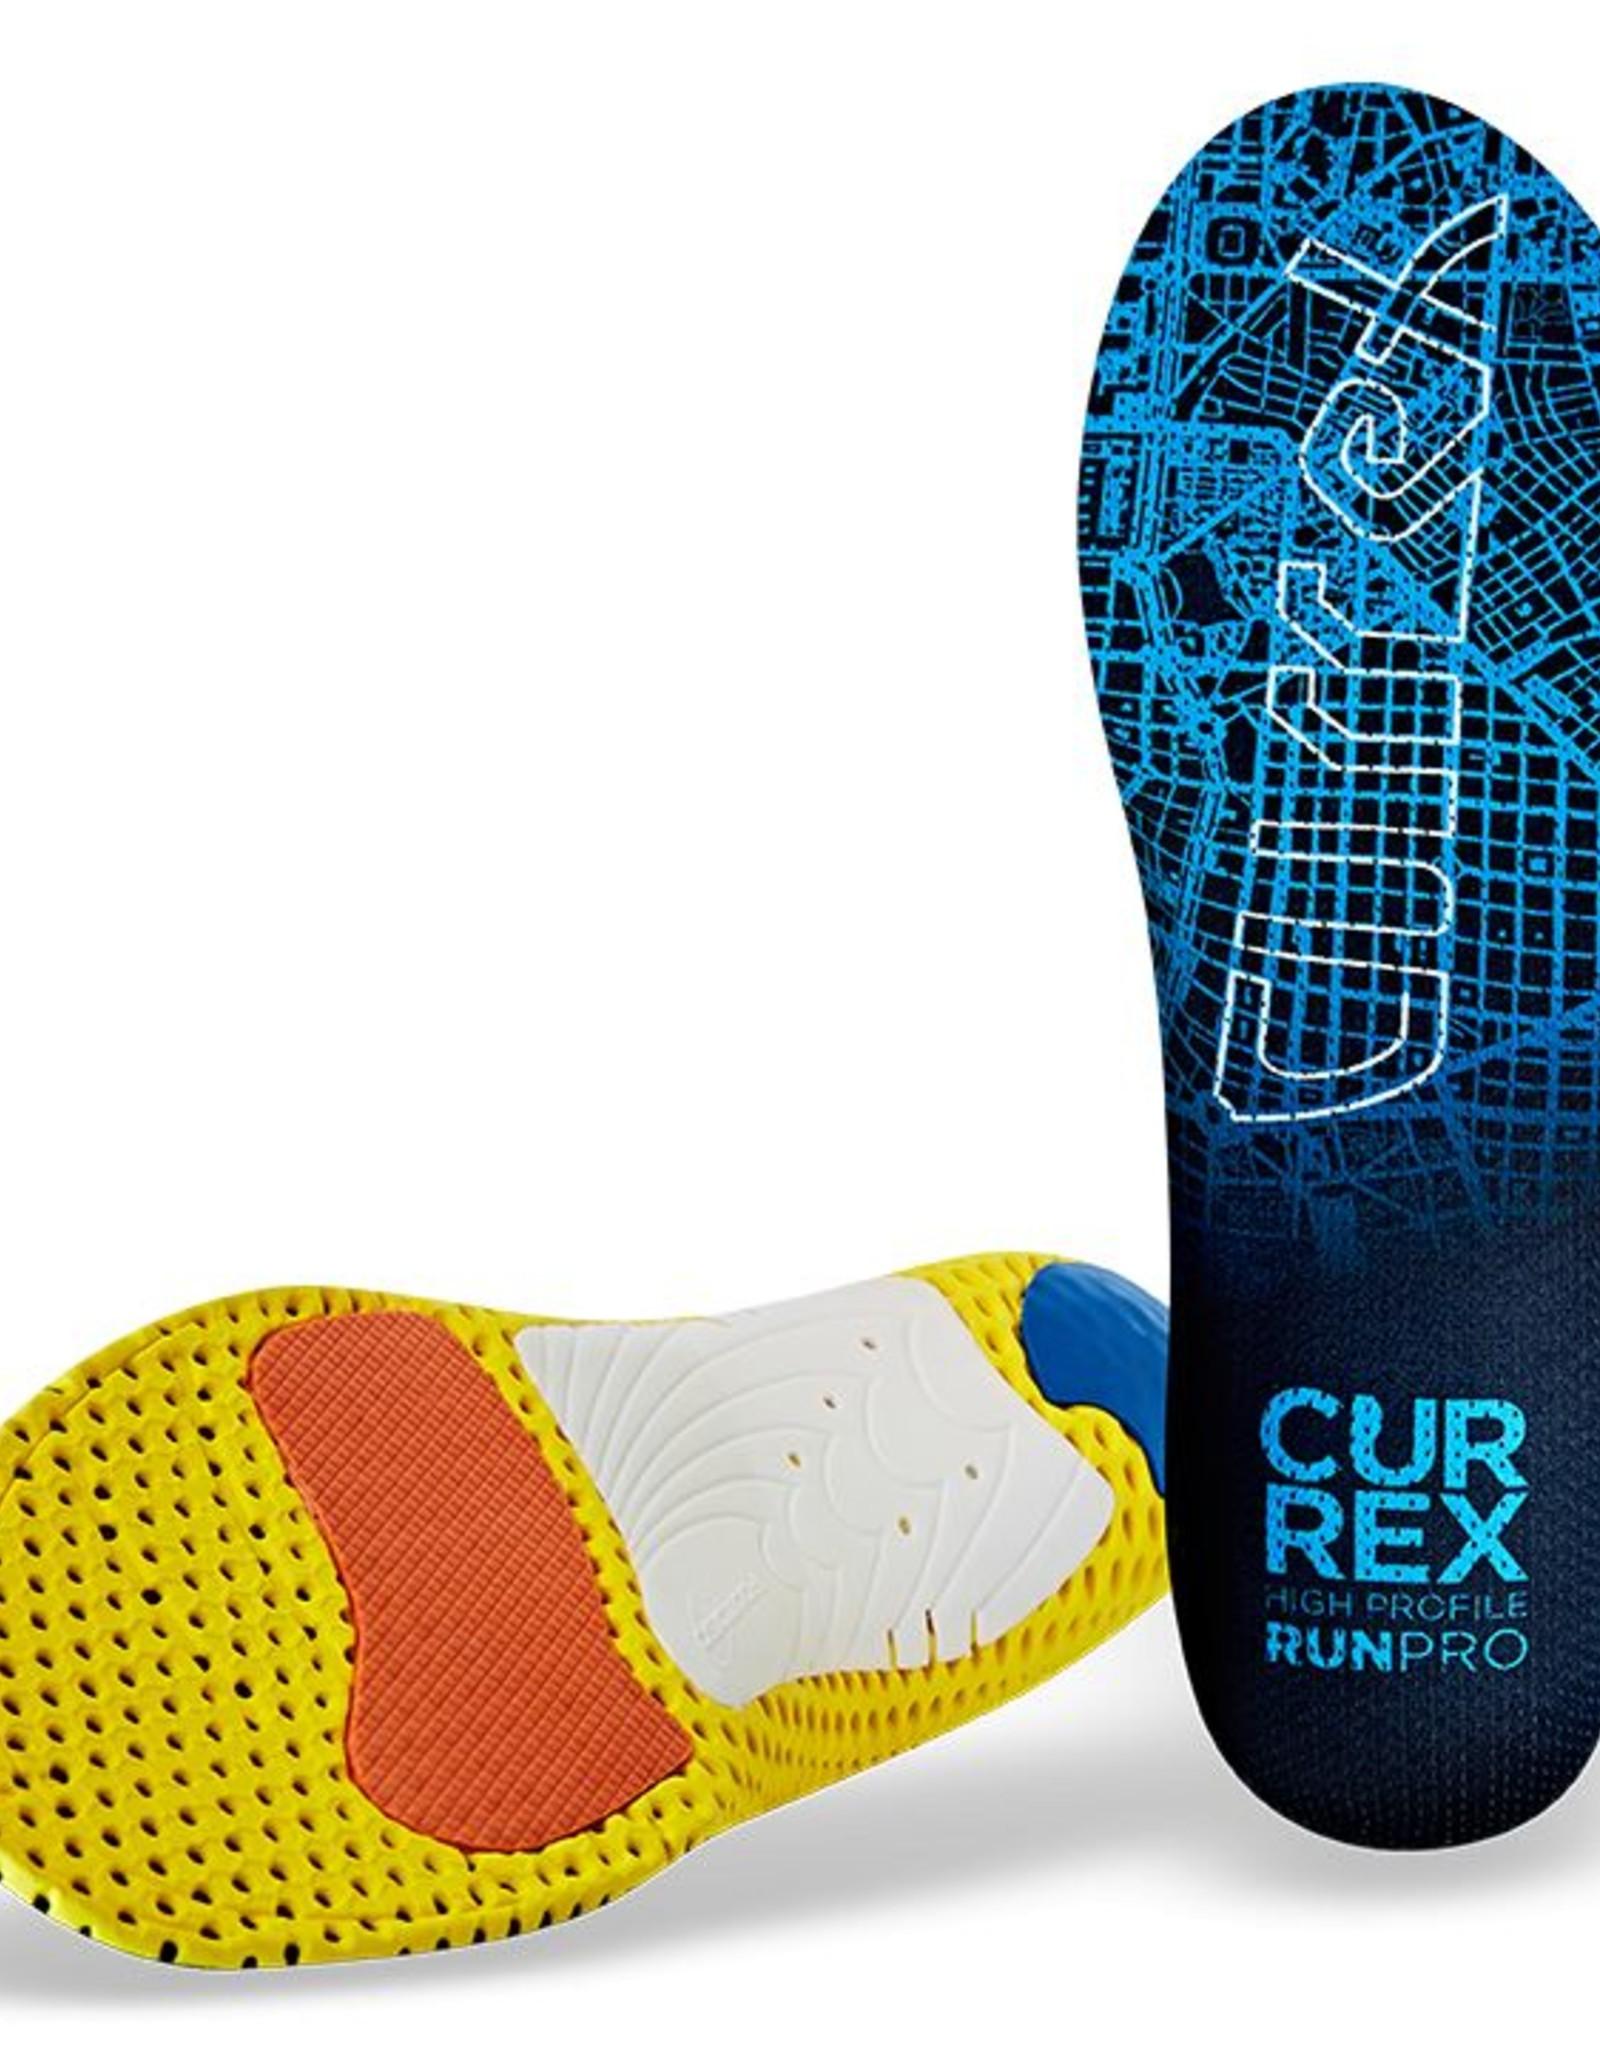 CURREX RUNPRO HIGH